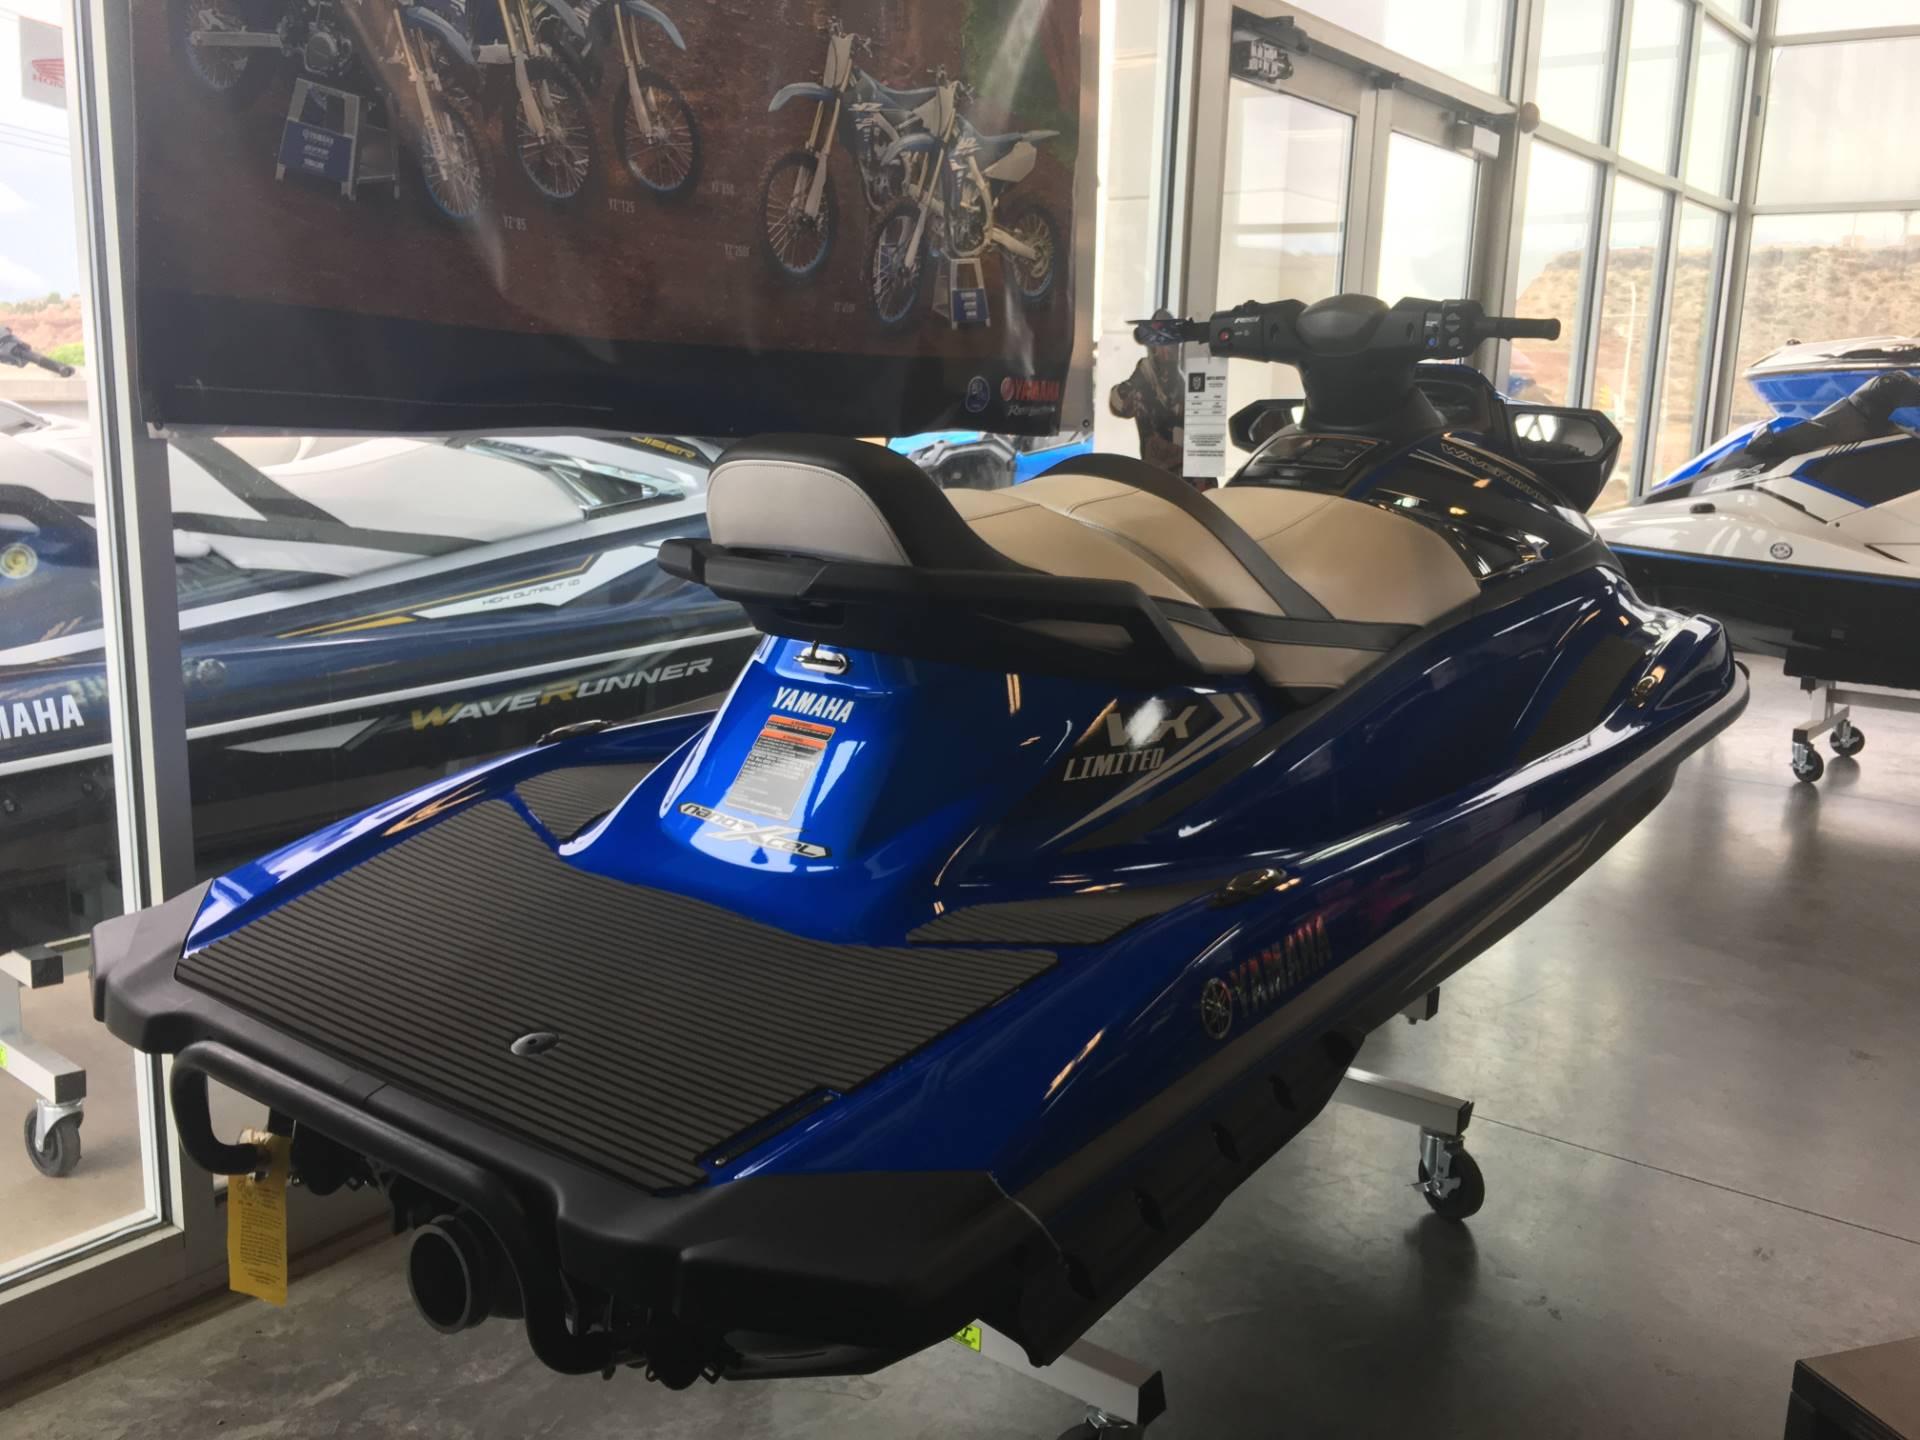 2017 Yamaha VX Limited 2